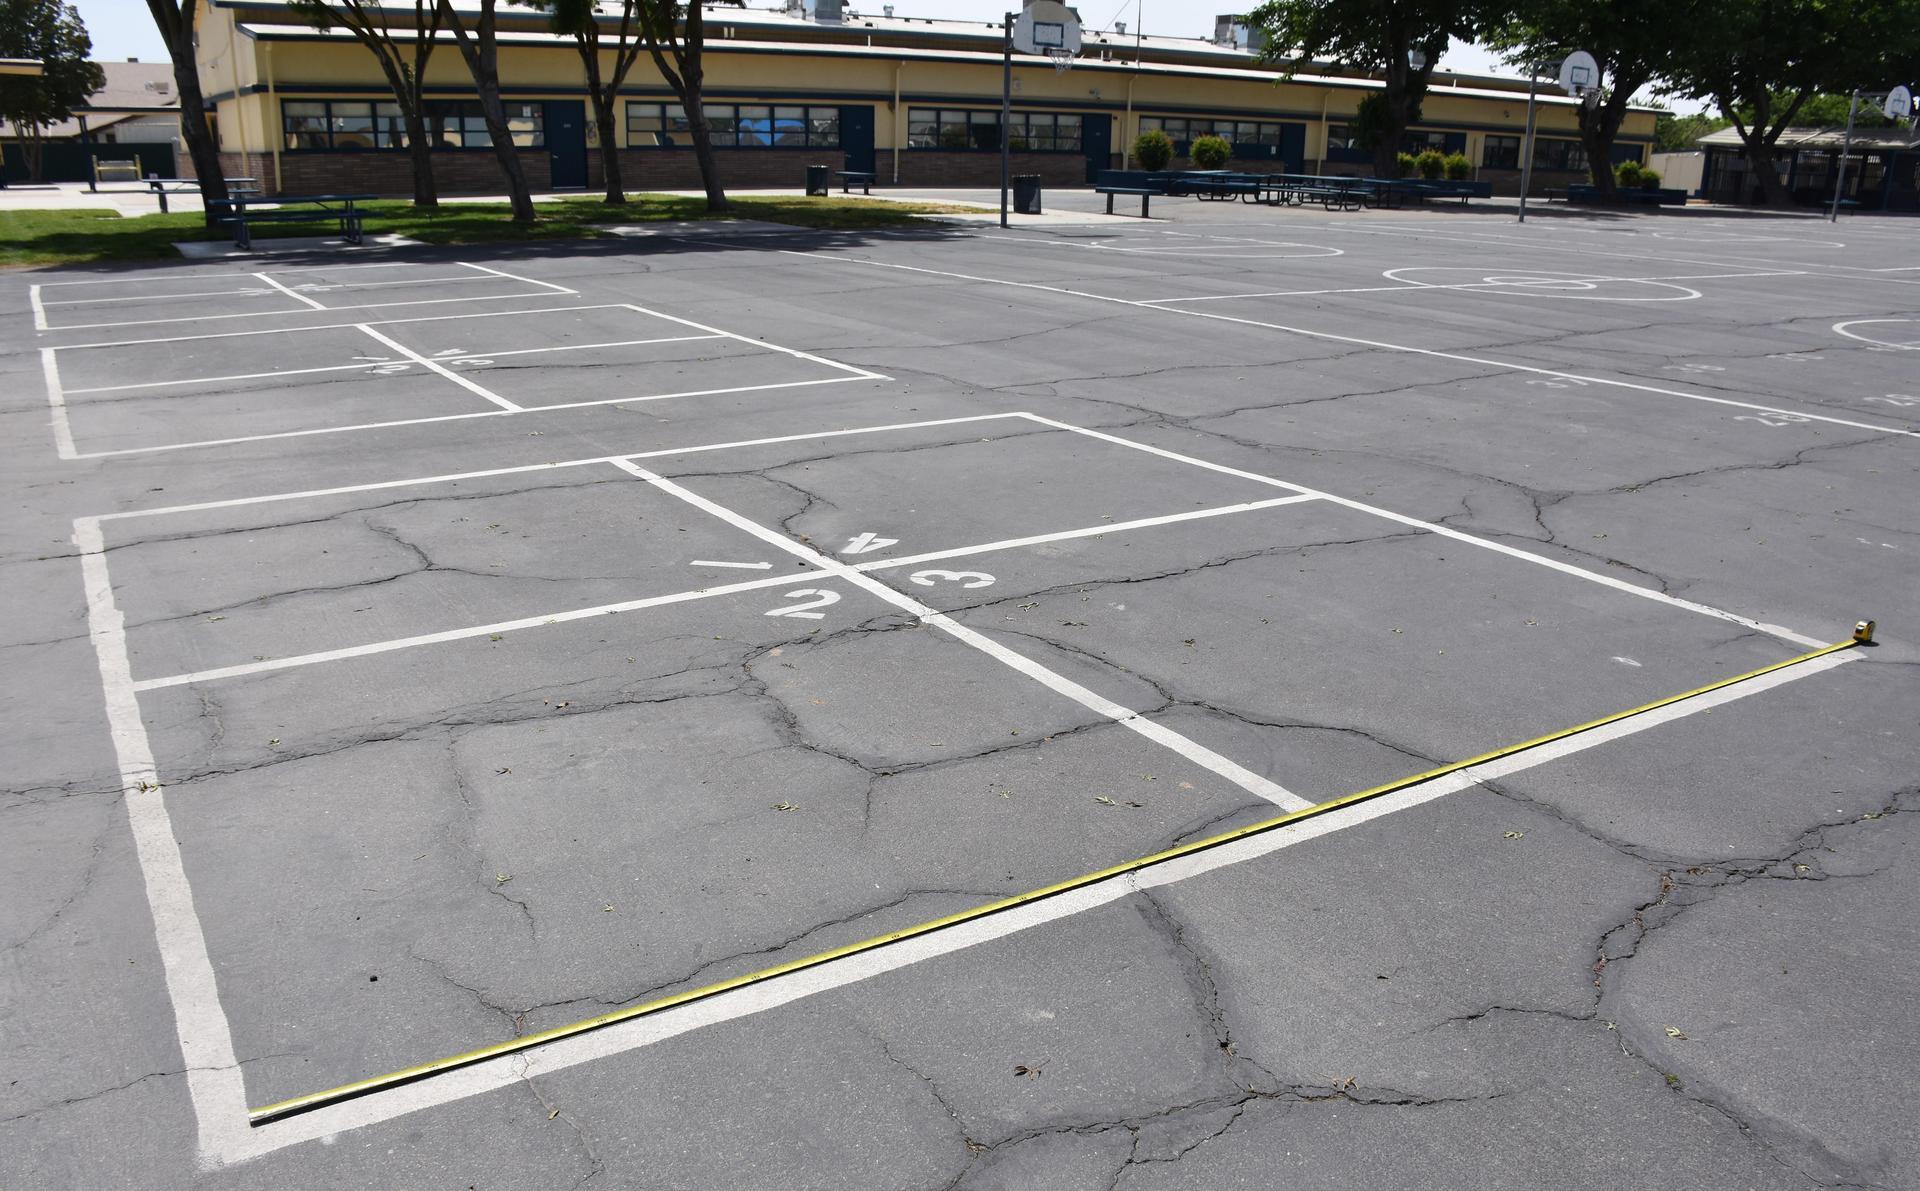 Four square court